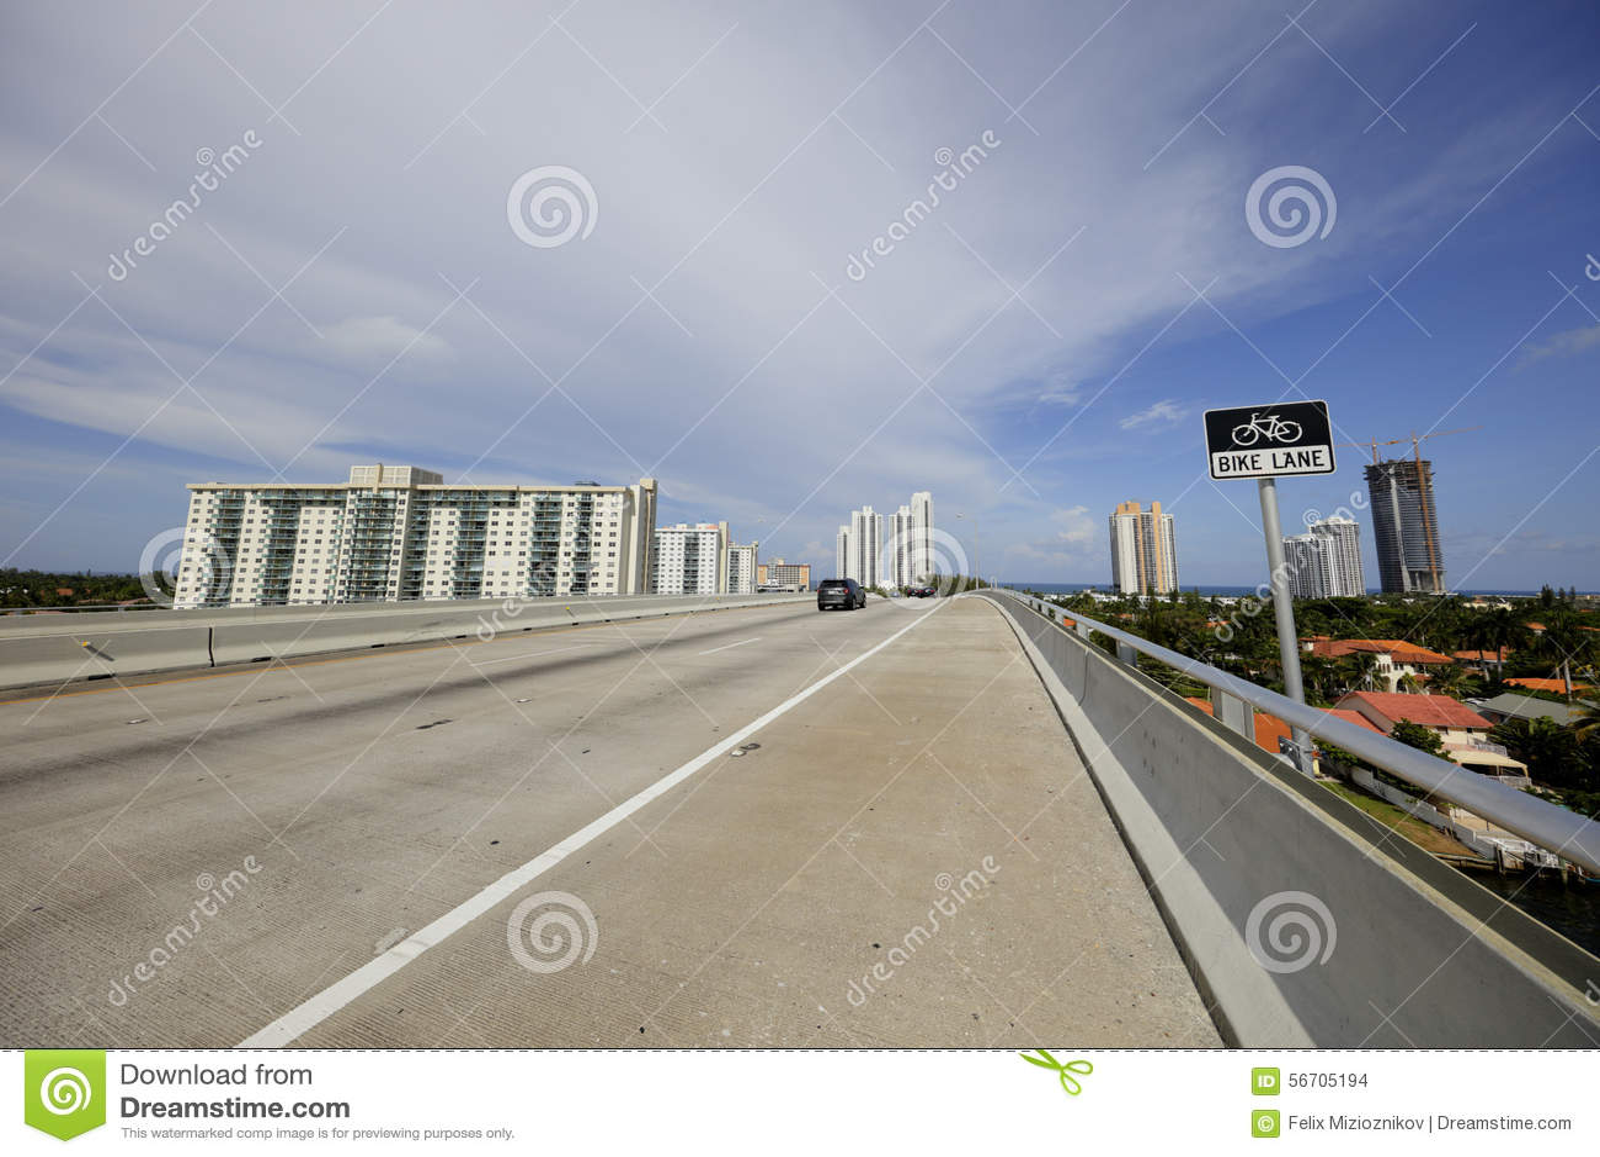 Bridge bike lane